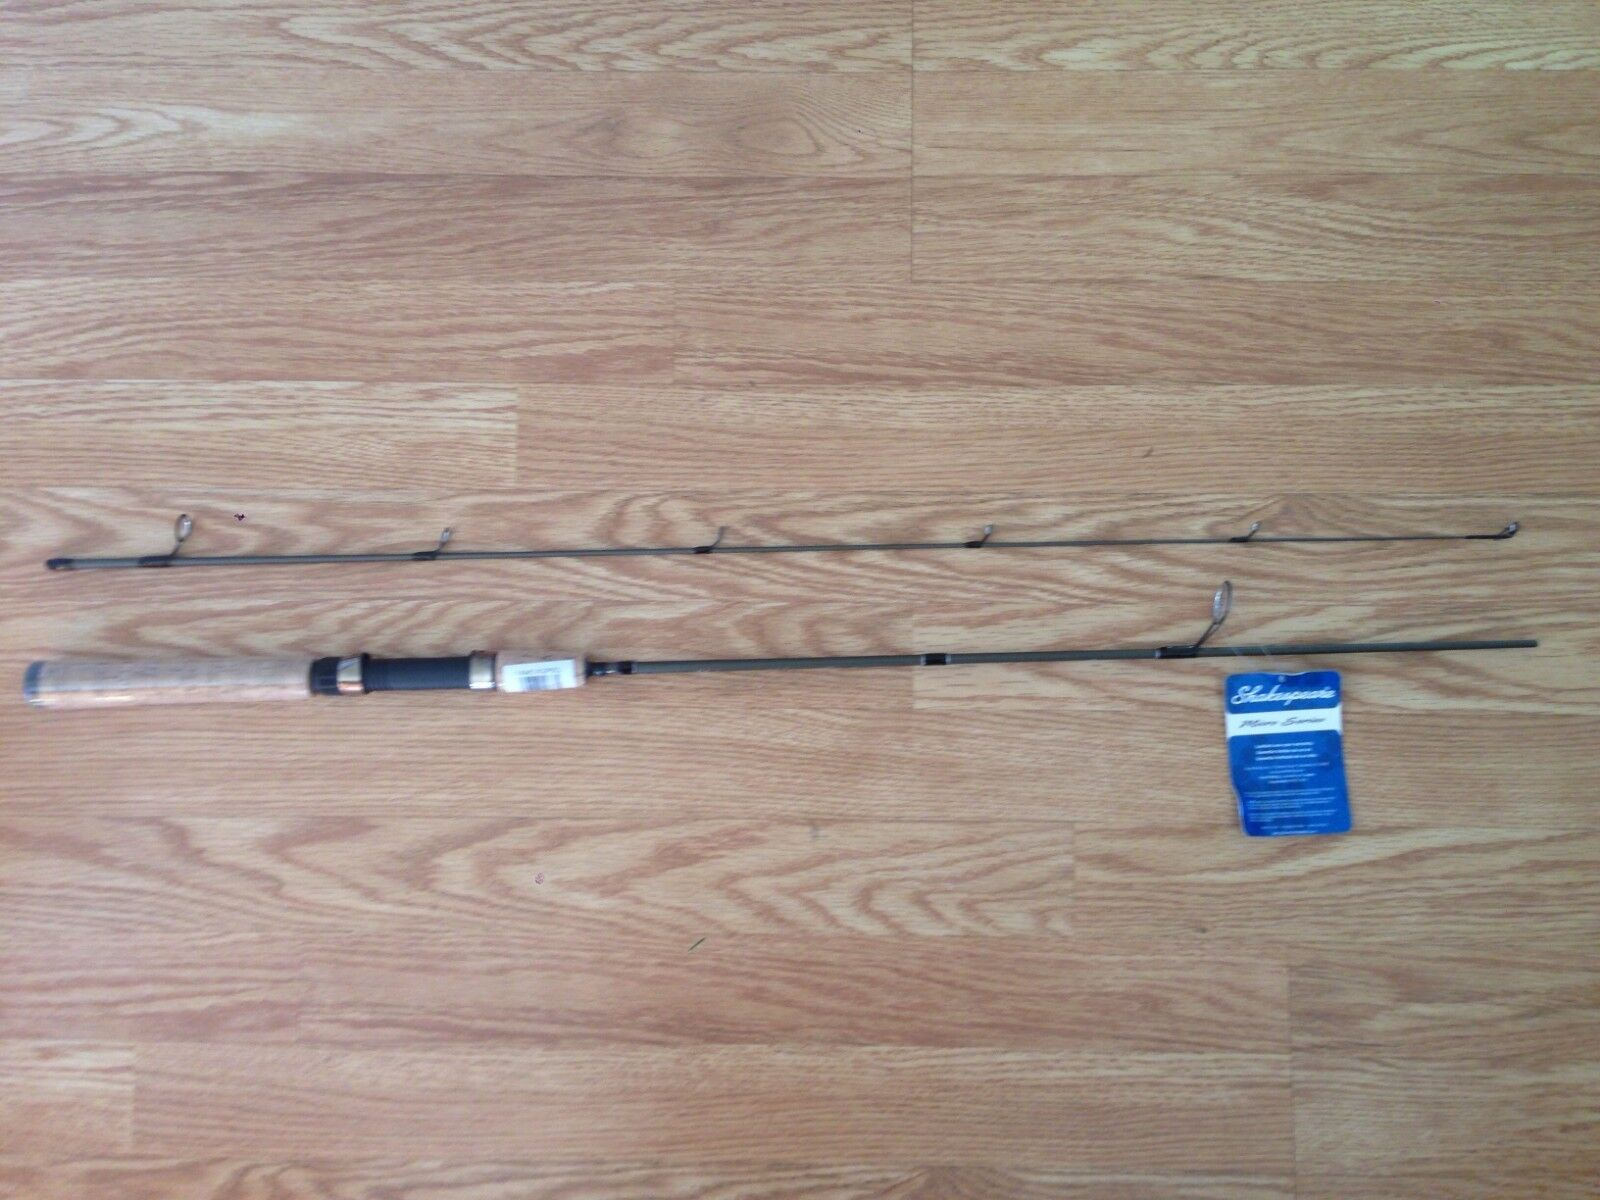 Micro Graphite Spinning Rod, 4'6